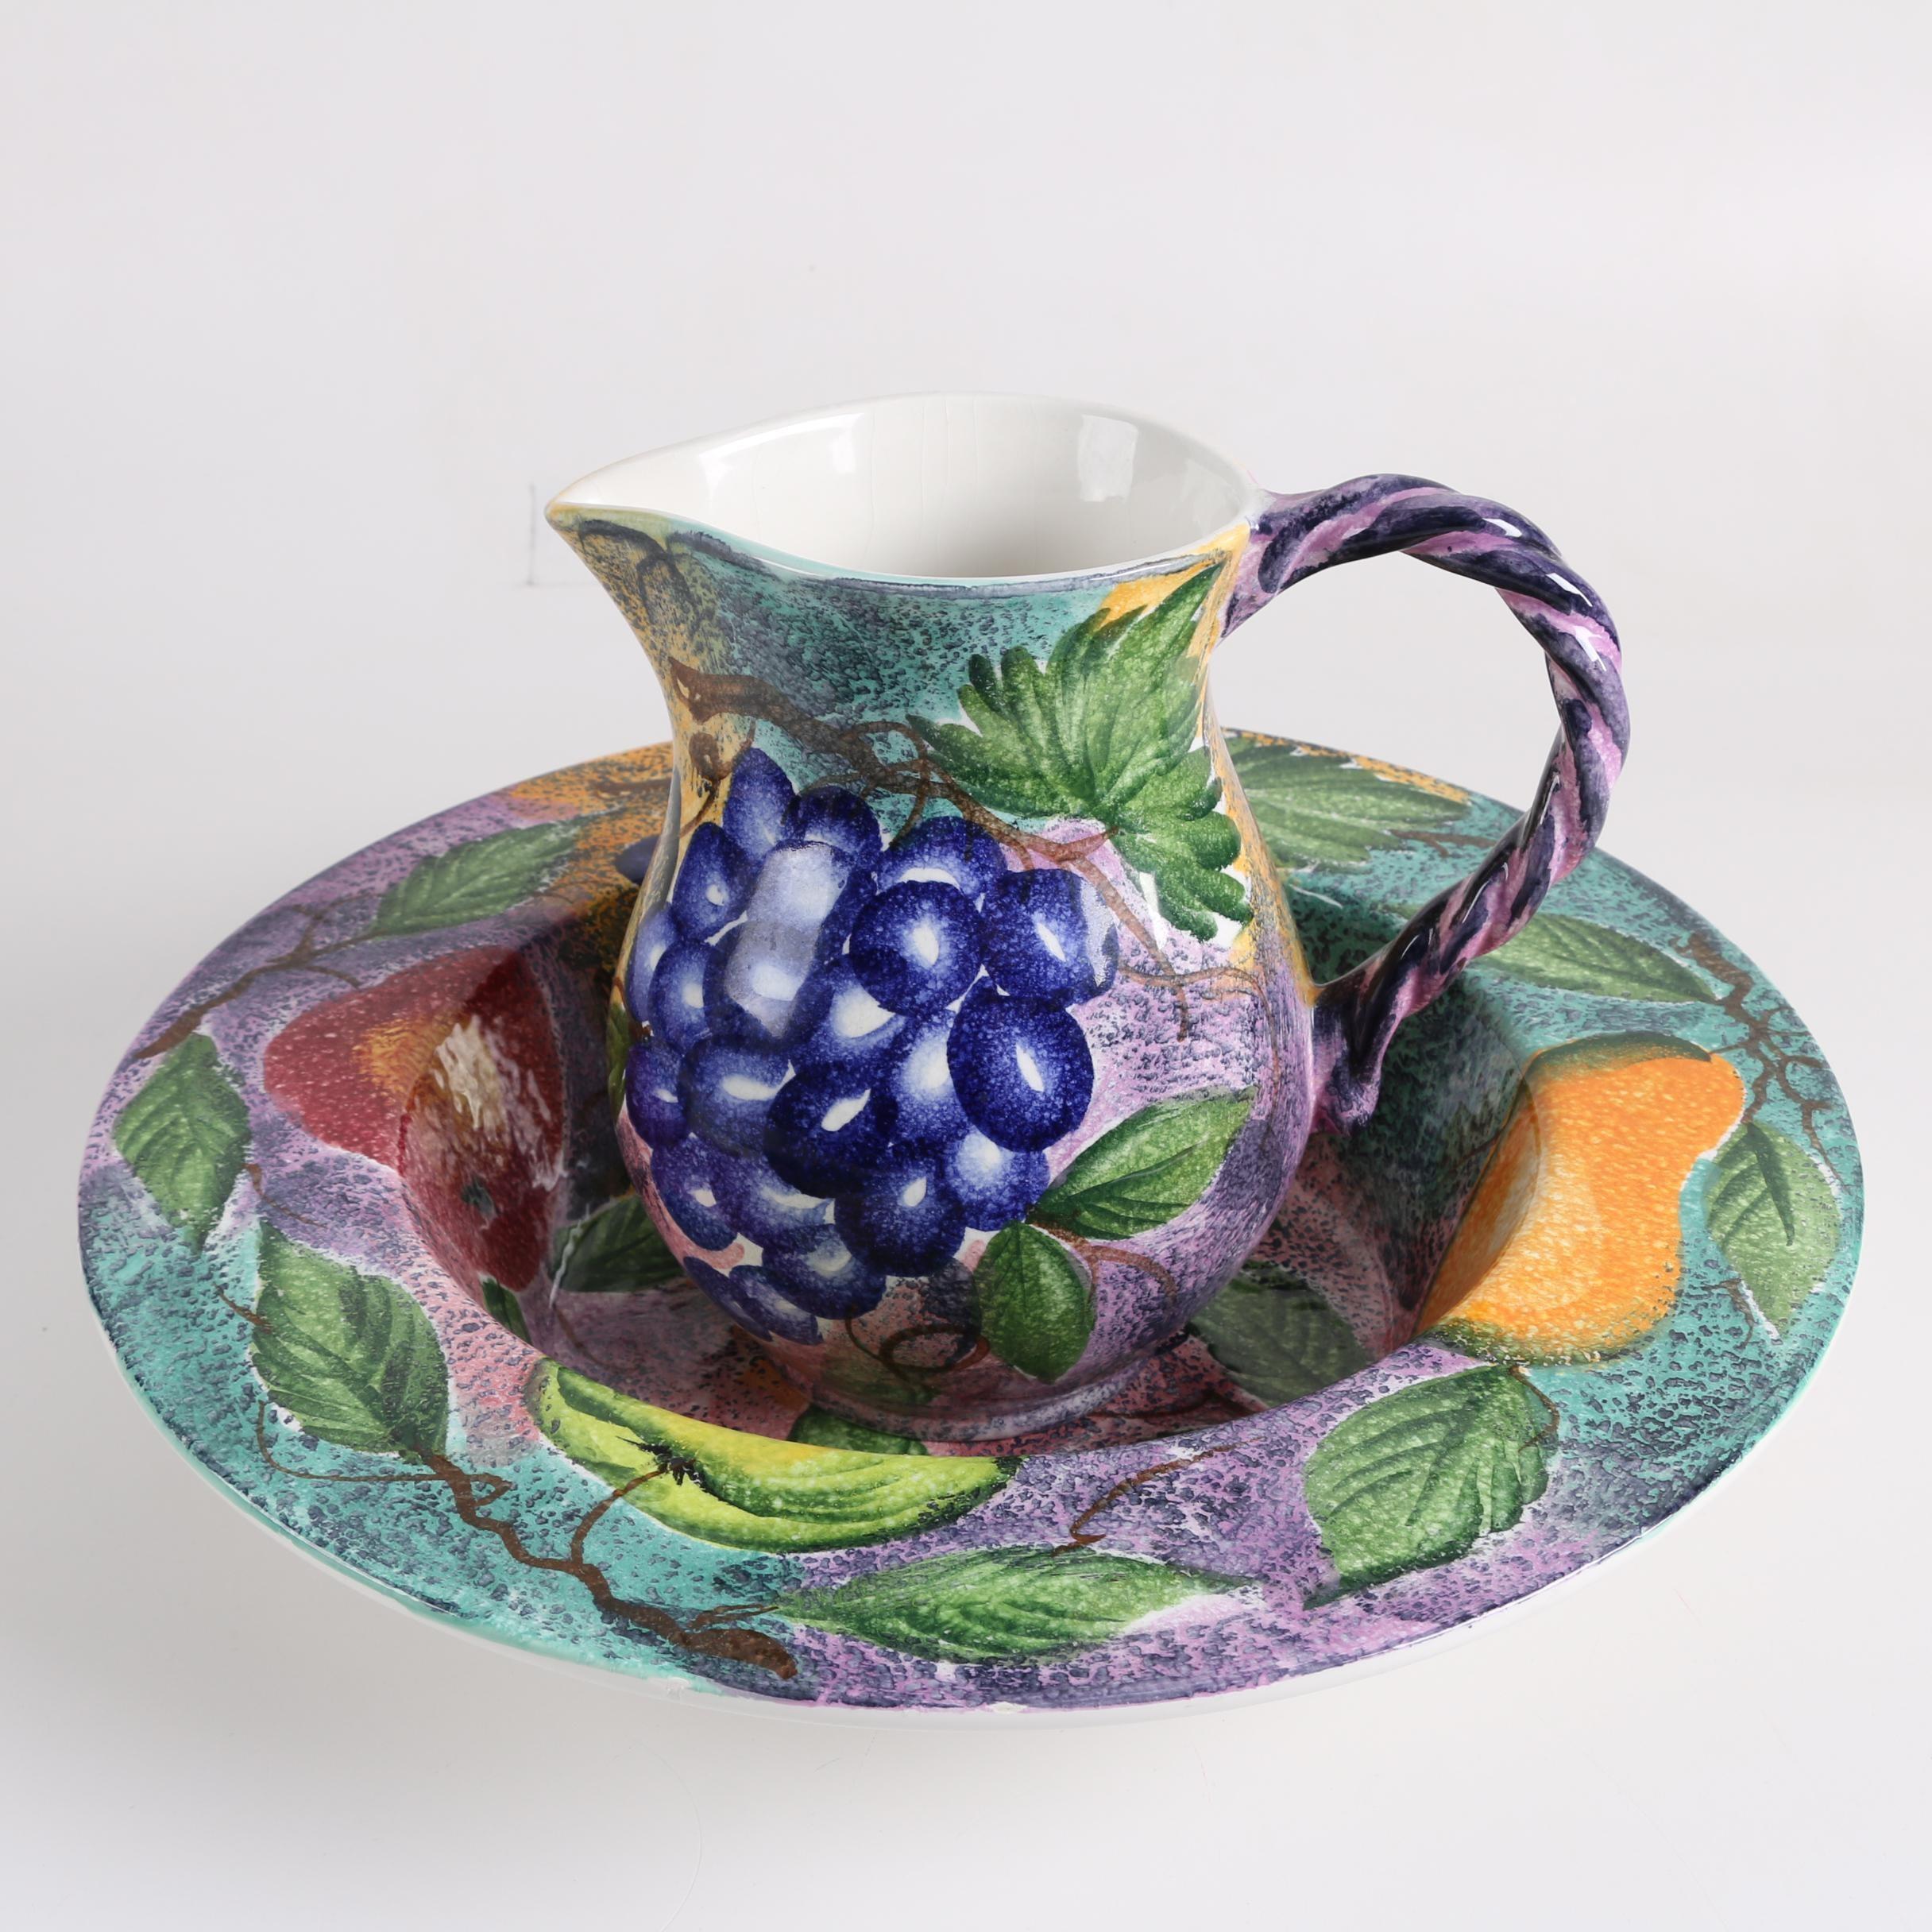 Italian Ancora Ceramic Pitcher and Basin